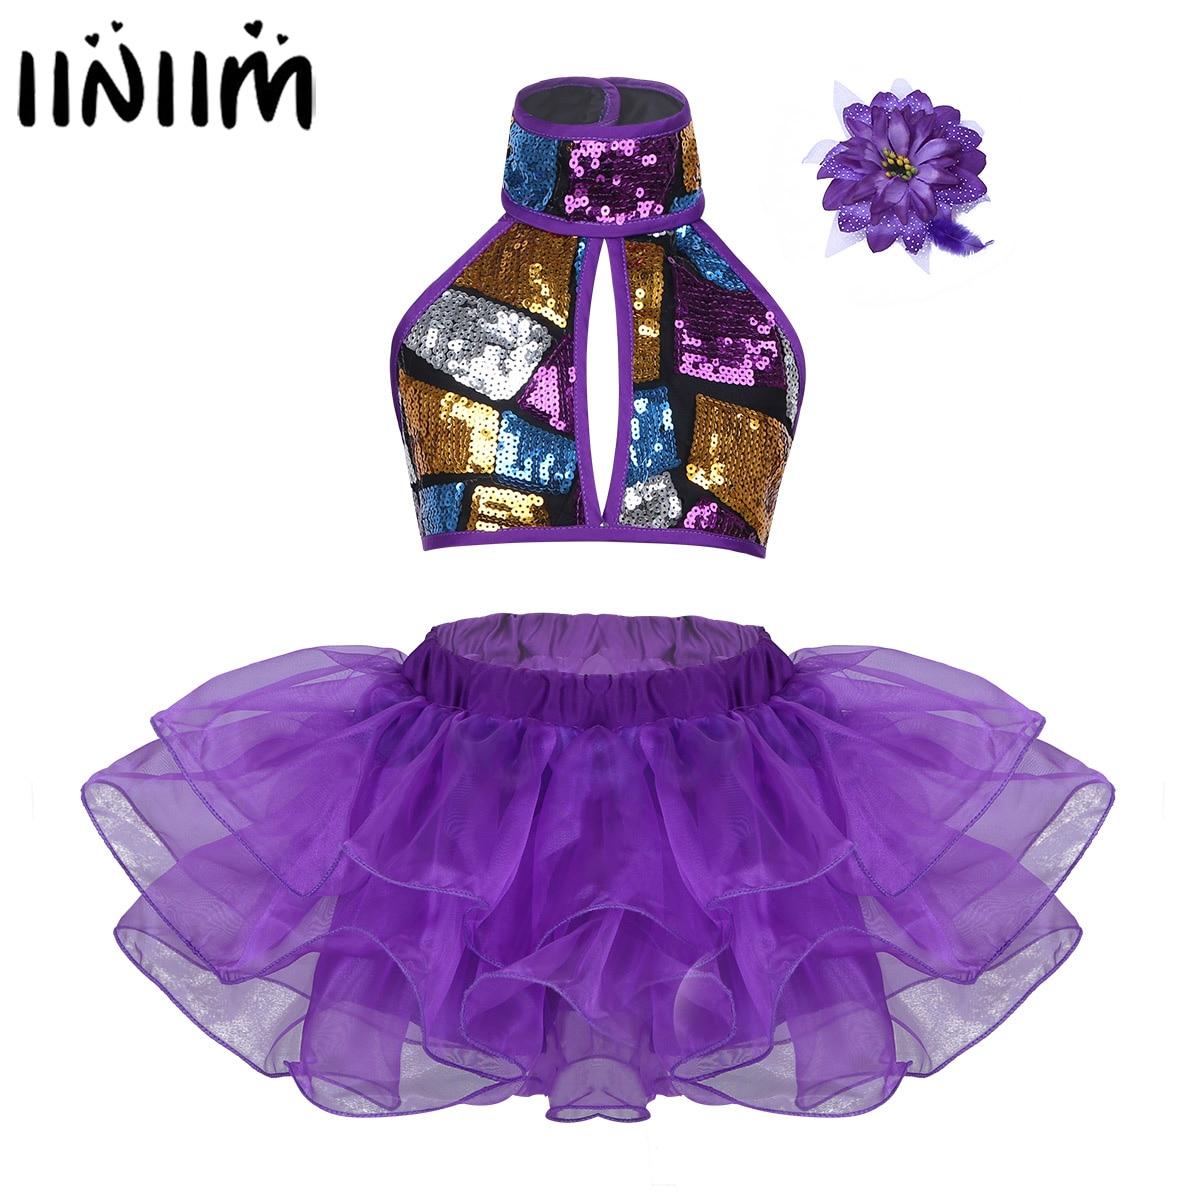 kids-girls-tutu-dance-costumes-ballroom-dancing-halter-shiny-sequins-crop-top-with-skirts-hair-clip-gymnastics-font-b-ballet-b-font-dancewear